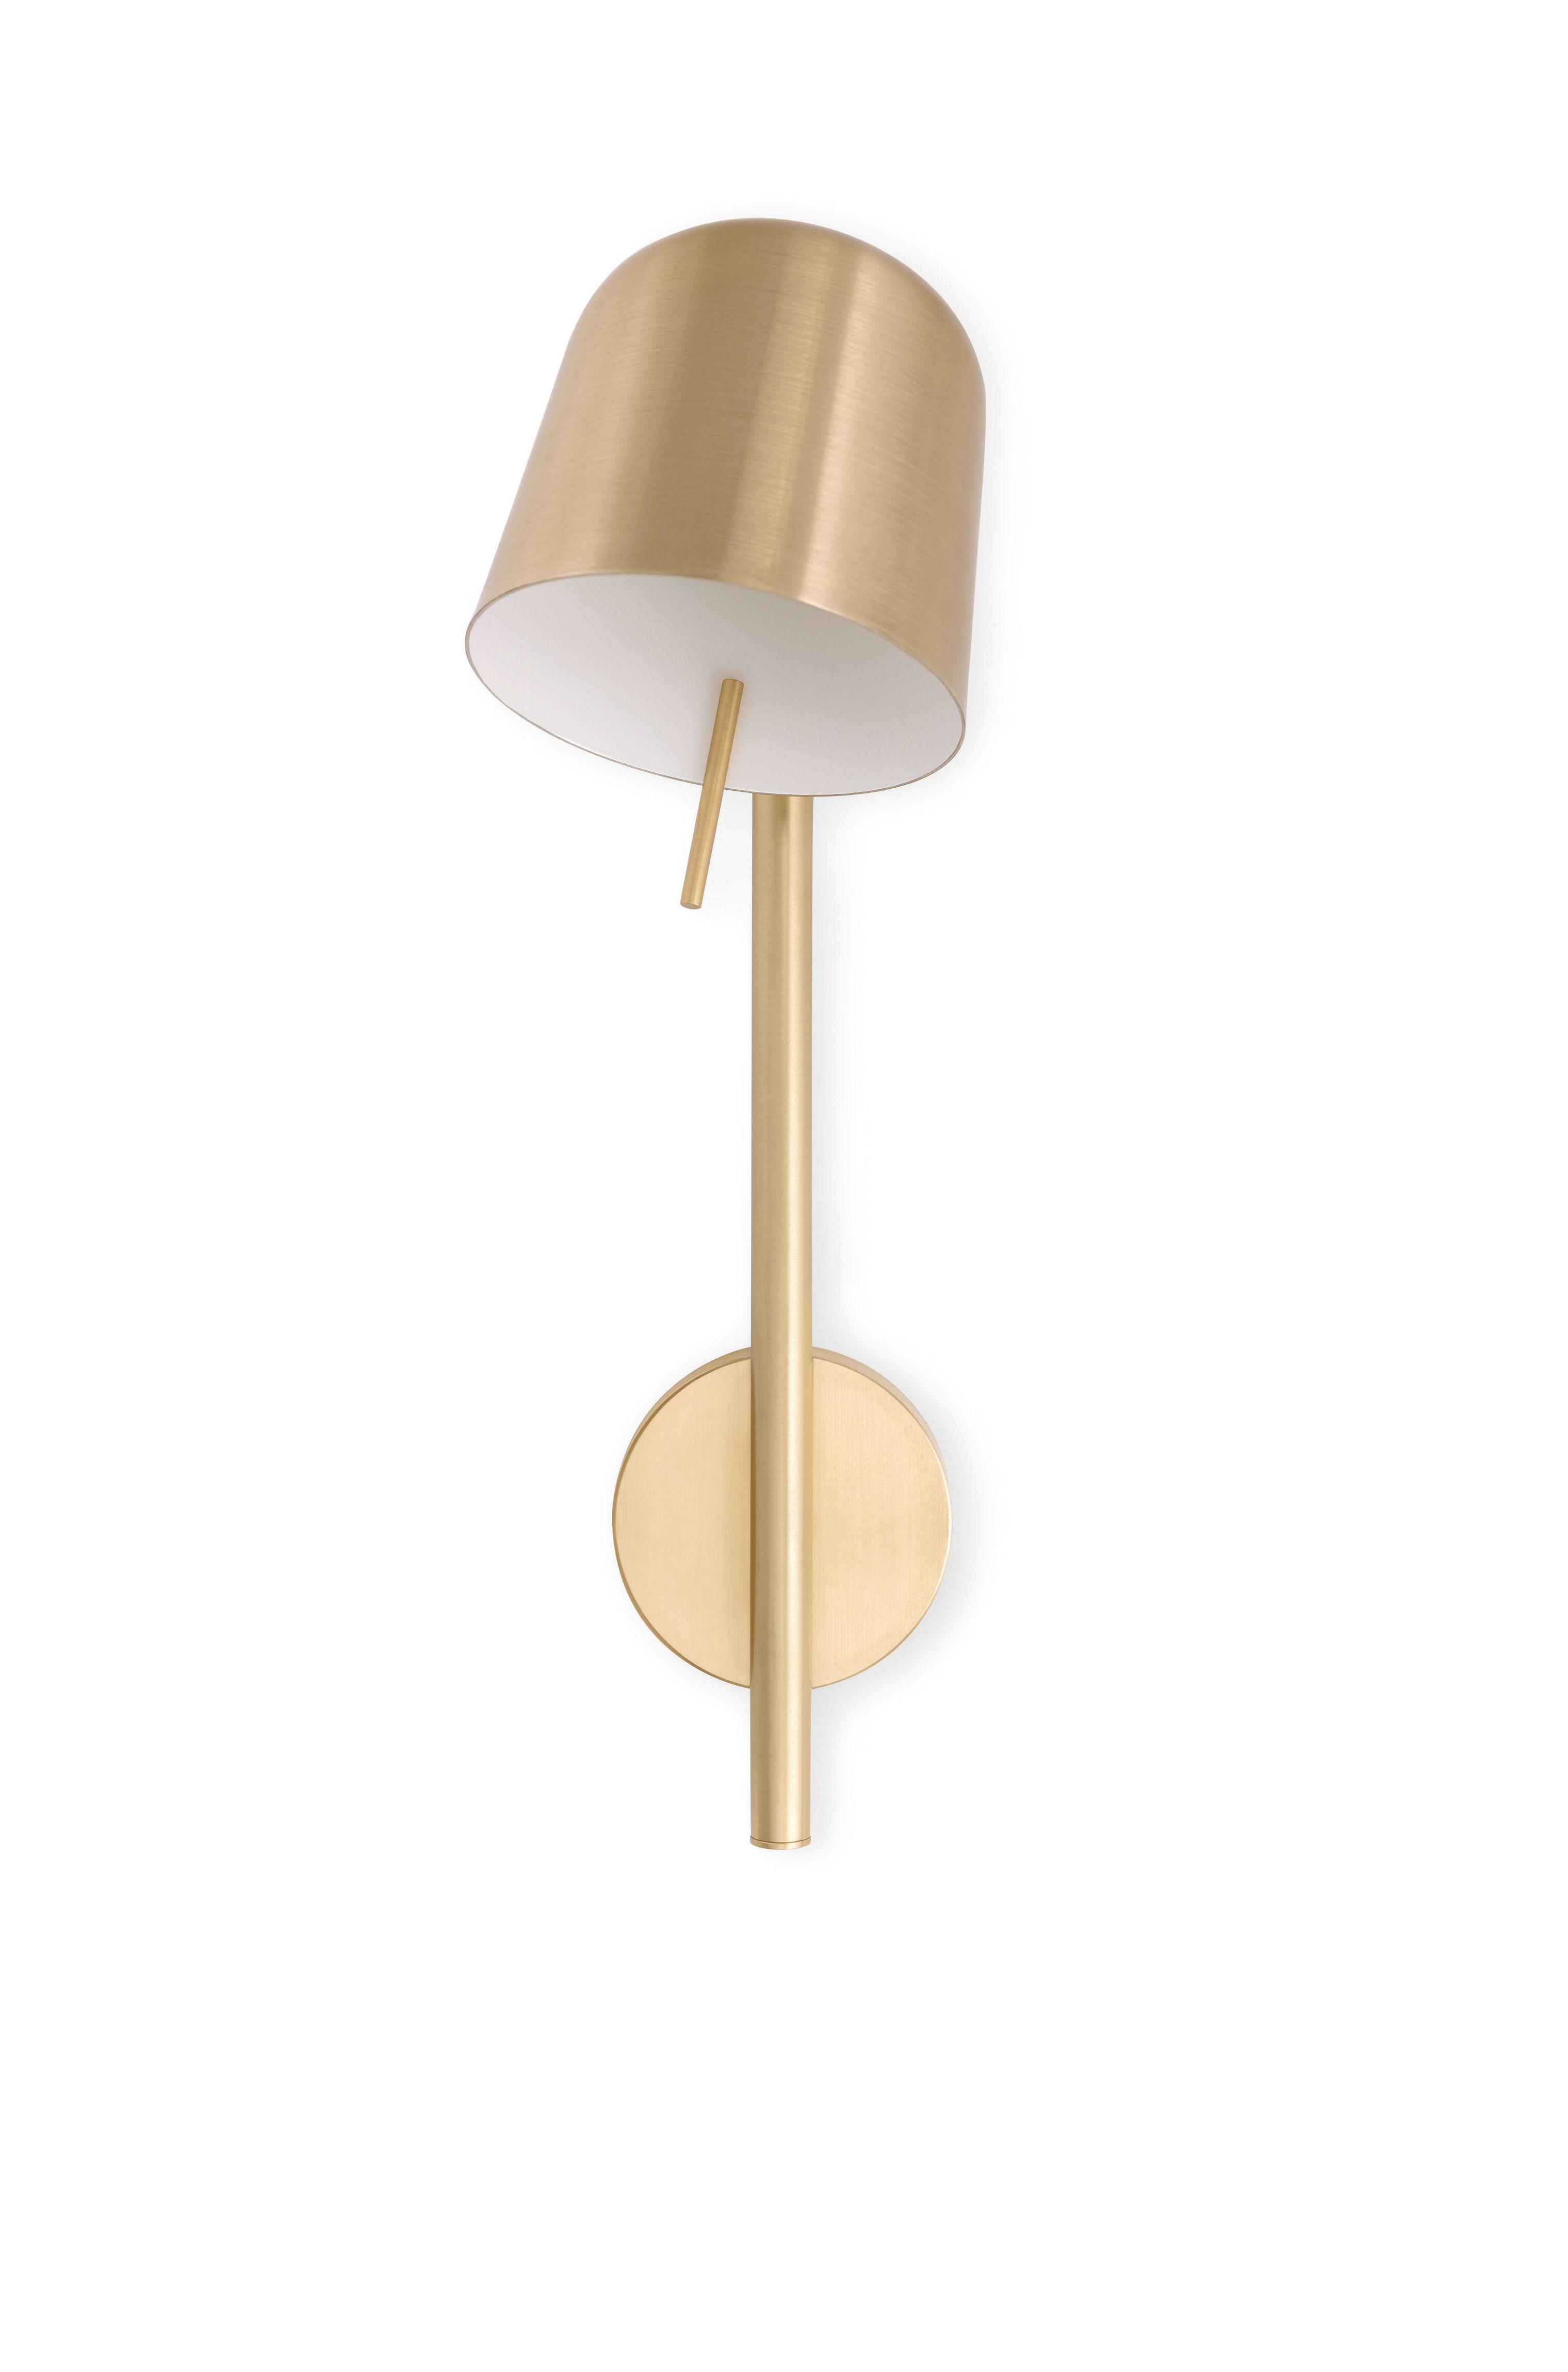 Lighting - Wall Lights - HÔ! Wall light - / Orientable by Spécimen Editions - Brass - Brushed brass, Copper